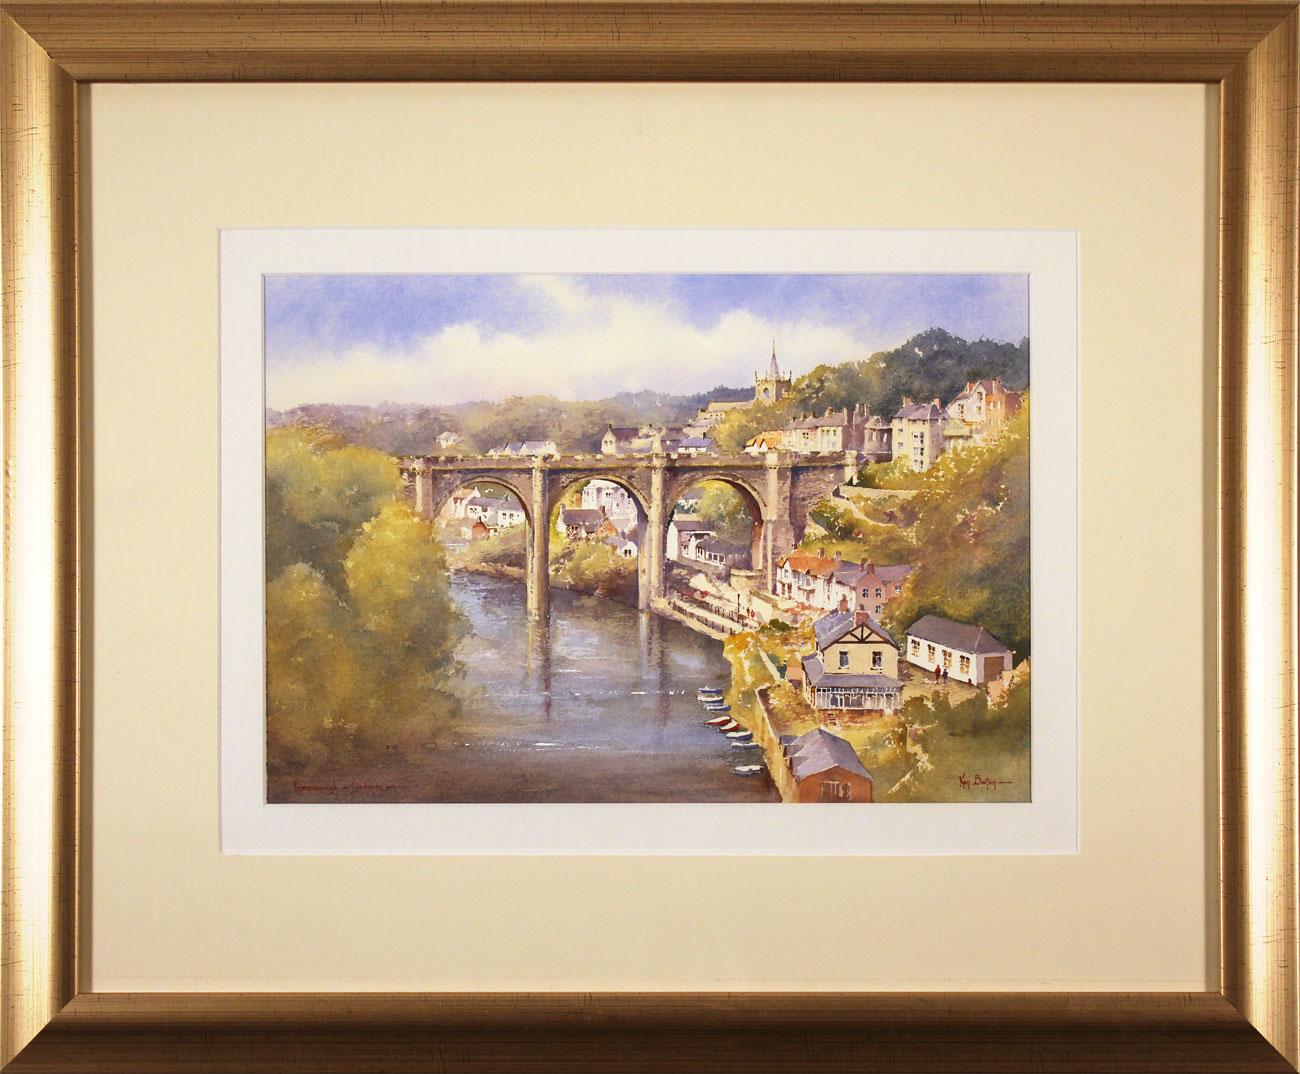 Ken Burton, Watercolour, Knaresborough, Yorkshire, click to enlarge